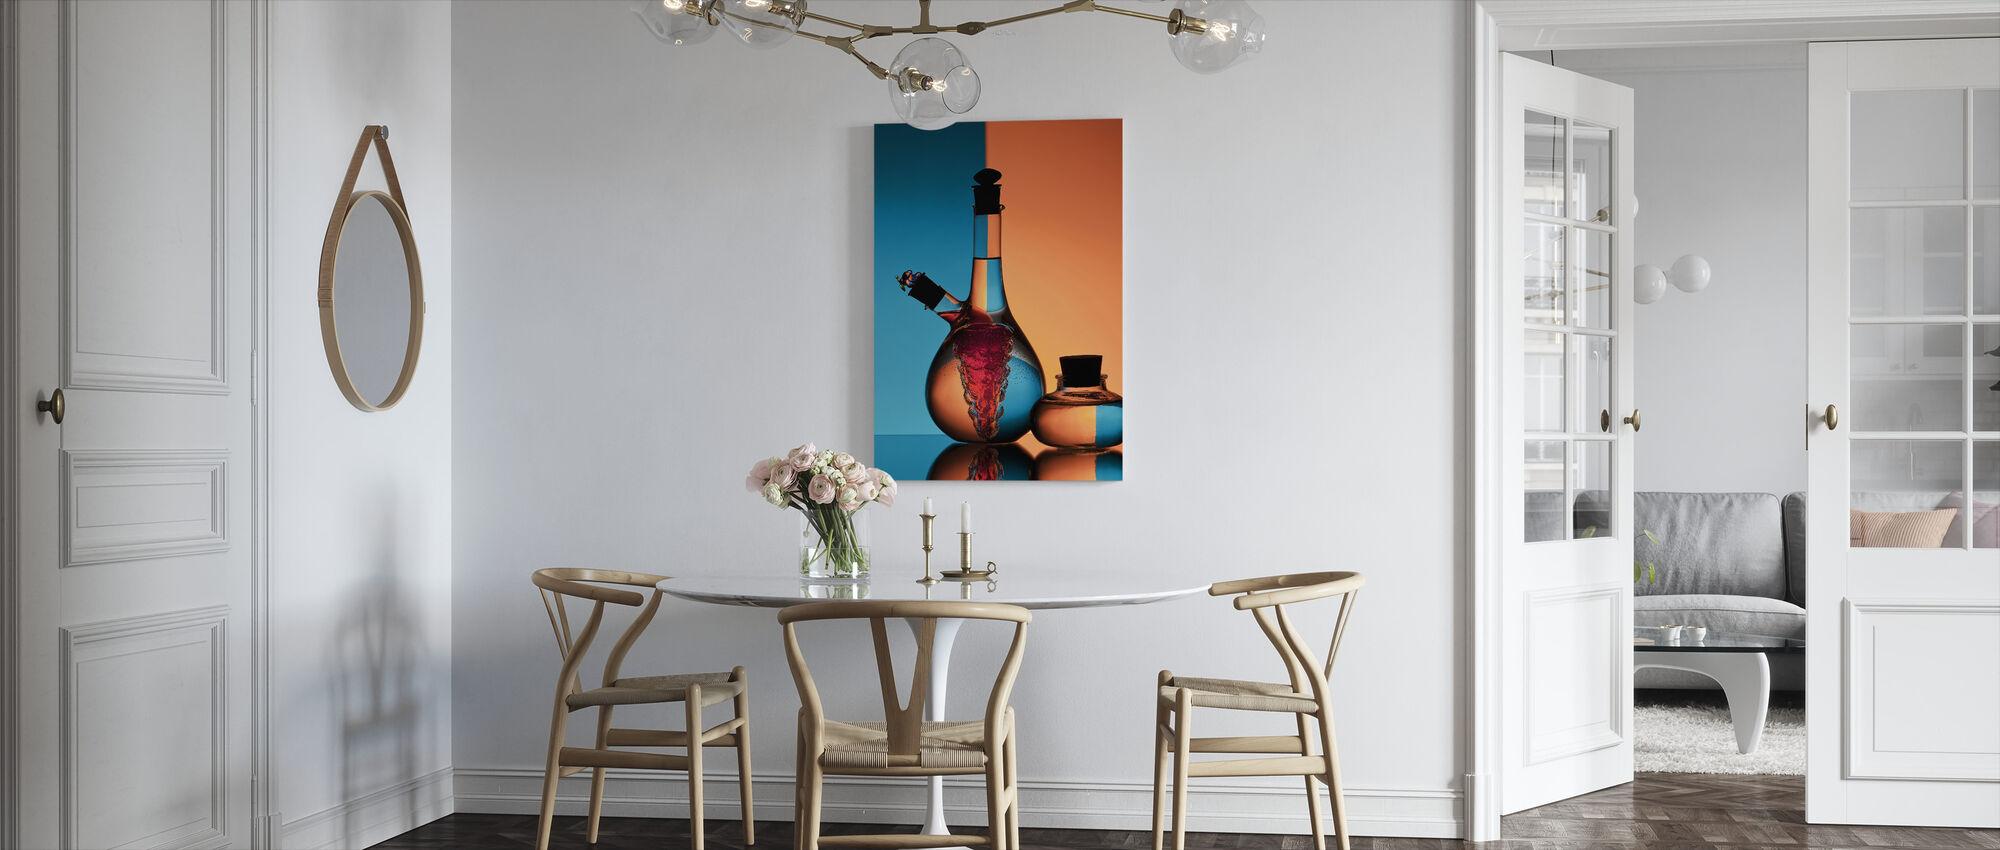 Oil & Vinegar - Canvas print - Kitchen